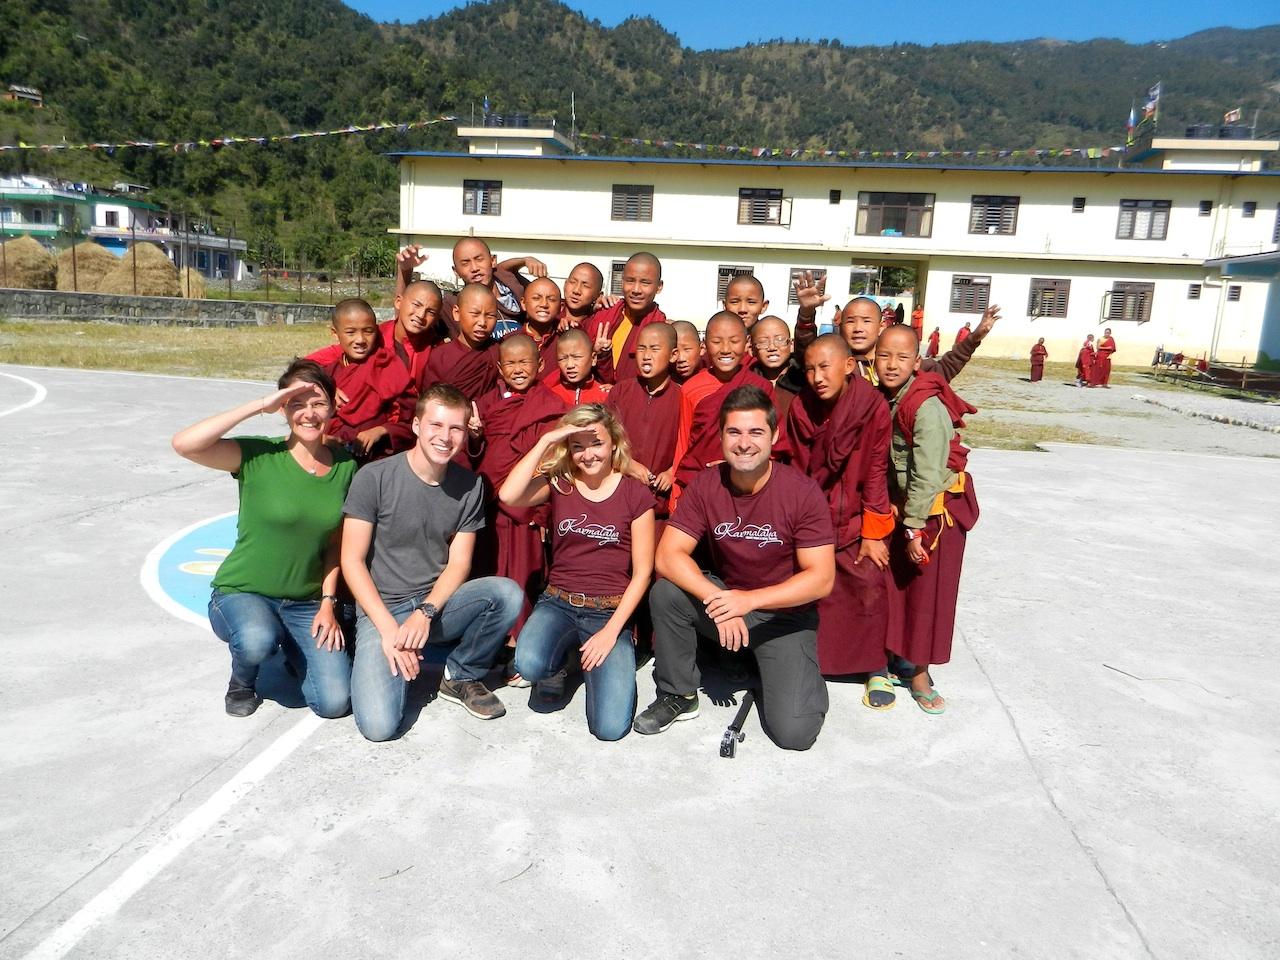 Klosterschule_Pokhara_Karmalaya